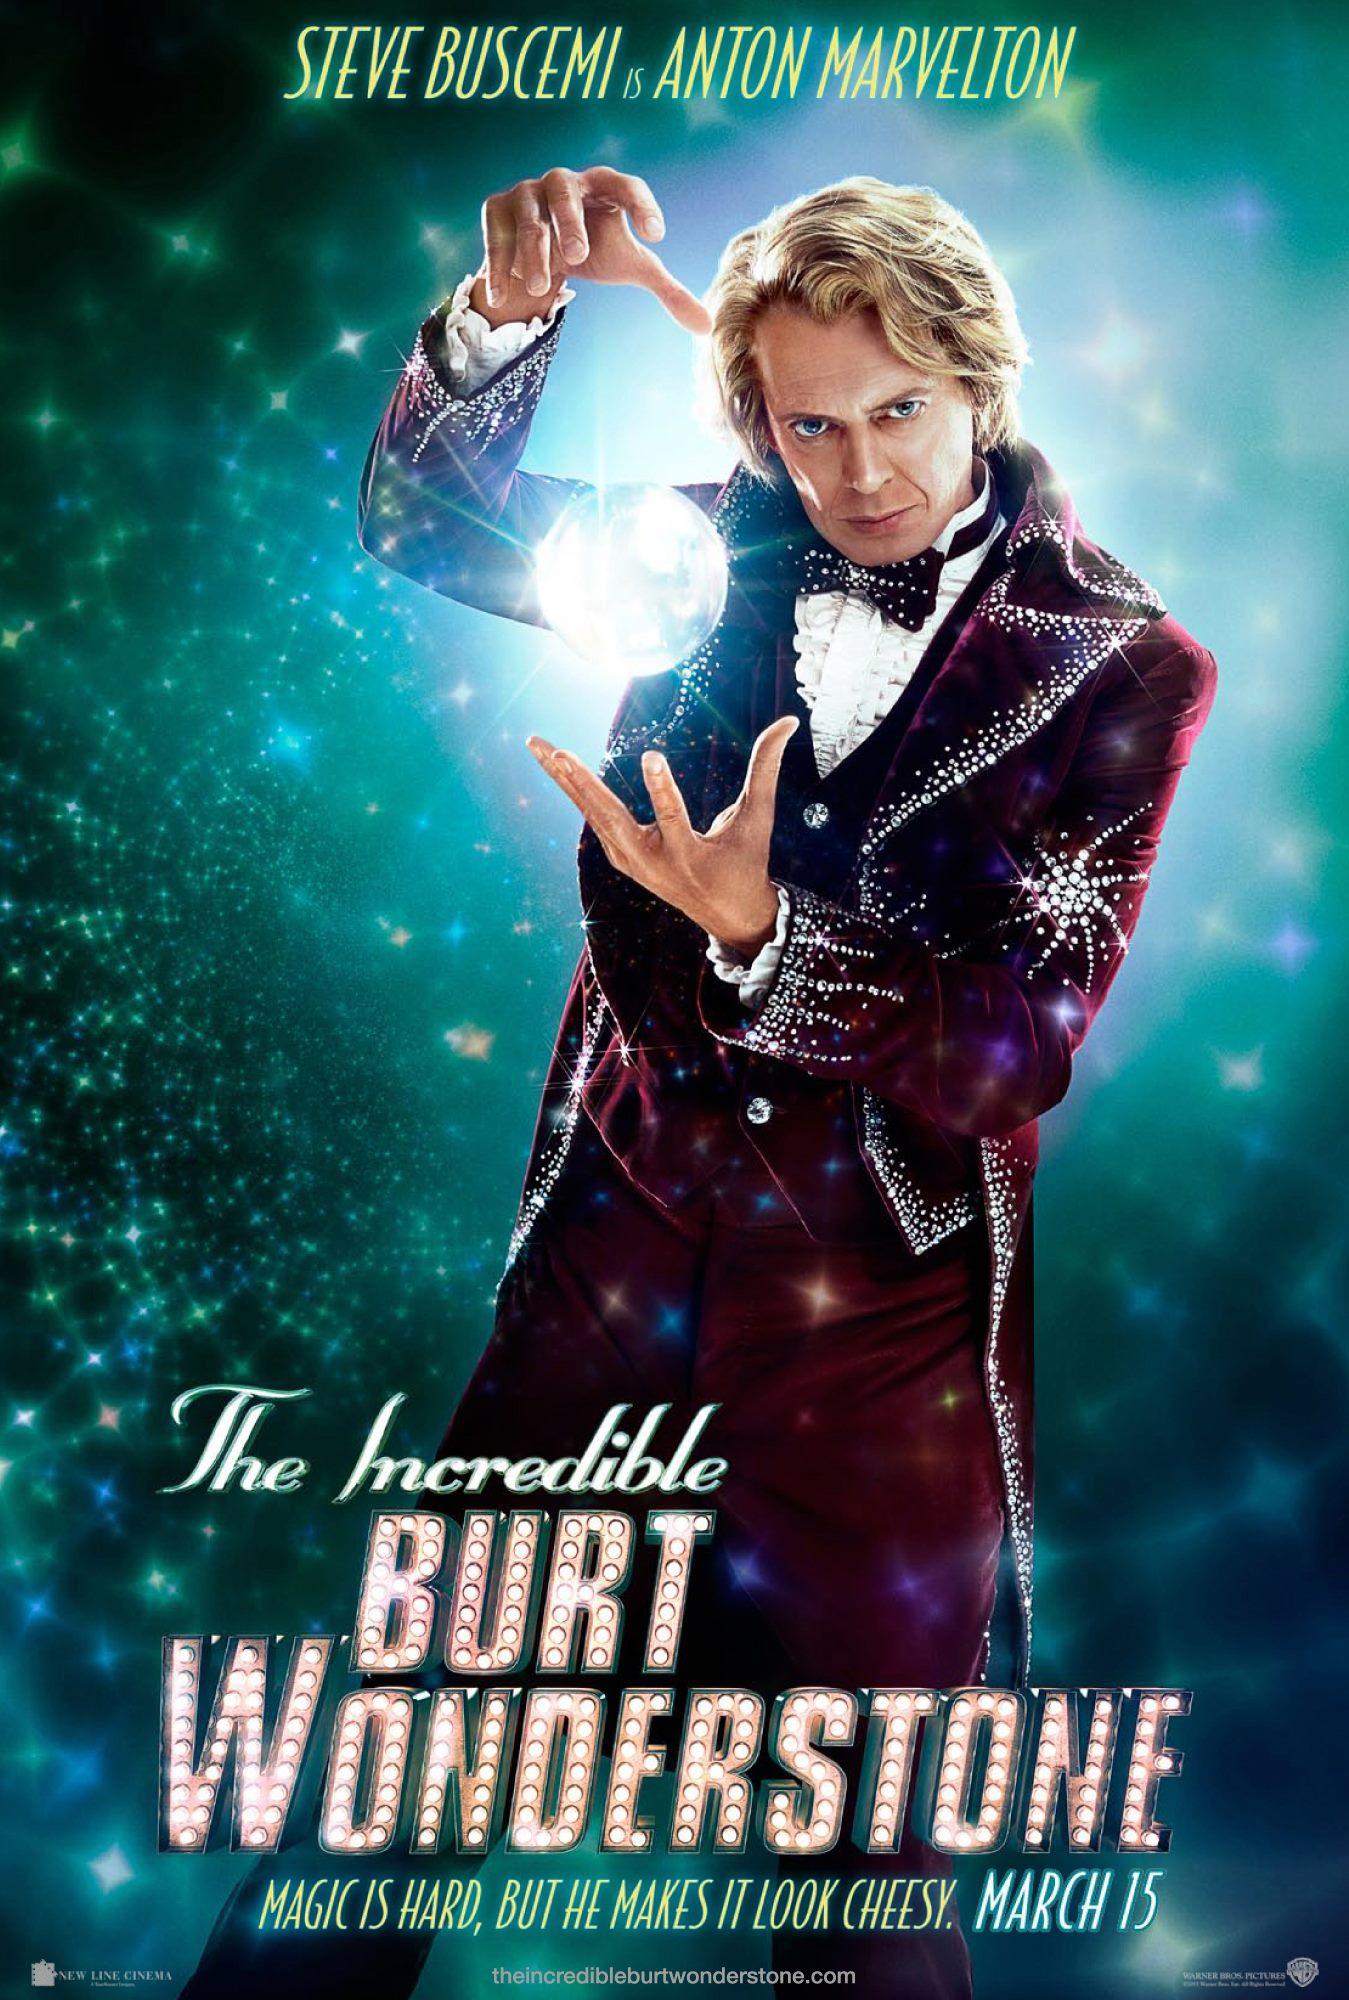 The Incredible Burt Wonderstone - Movie Poster #2 (Original)